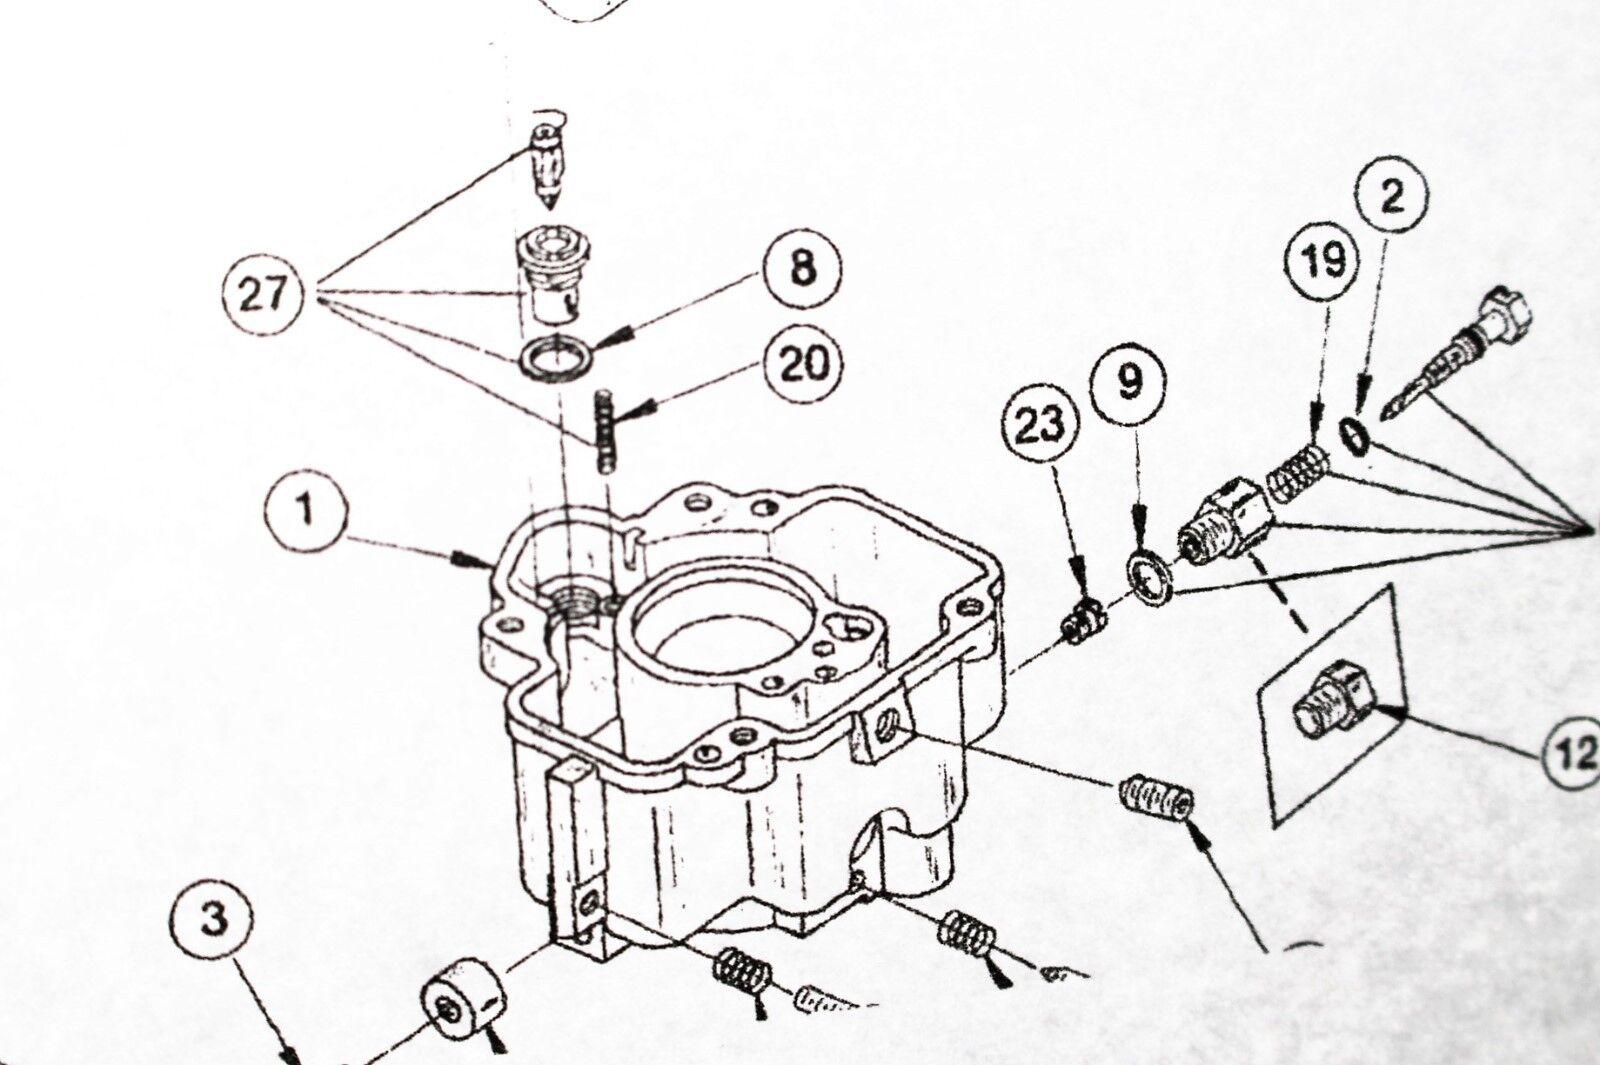 carburetor kit diagram lua7 fits onan 146 0230d 6 5 nh 4 bfa 5 Kohler Command 20 Wiring-Diagram carburetor kit diagram lua7 fits onan 146 0230d 6 5 nh 4 bfa 5 bga